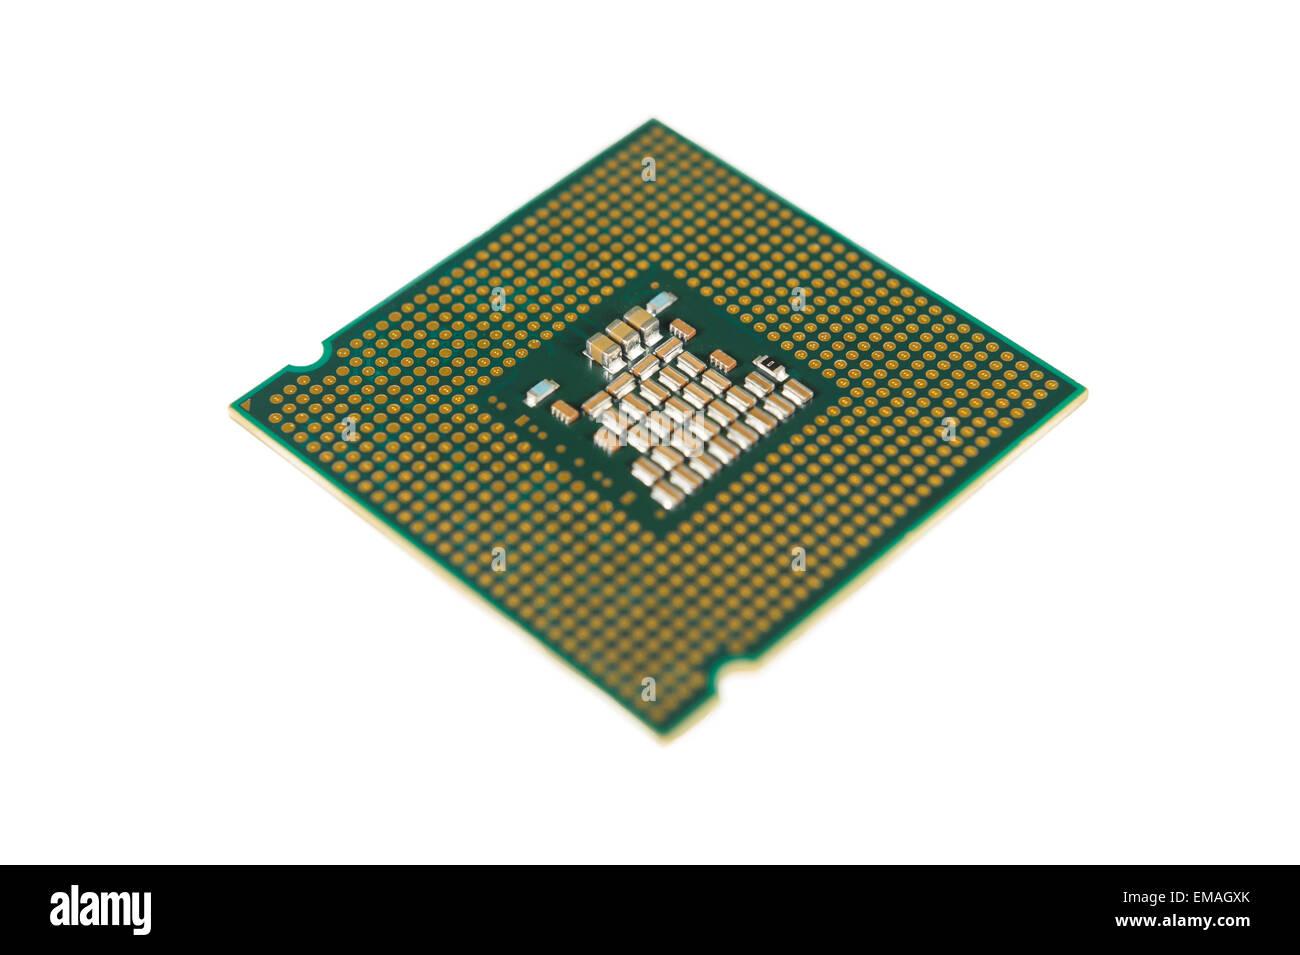 Processing Network Stockfotos & Processing Network Bilder - Seite 2 ...